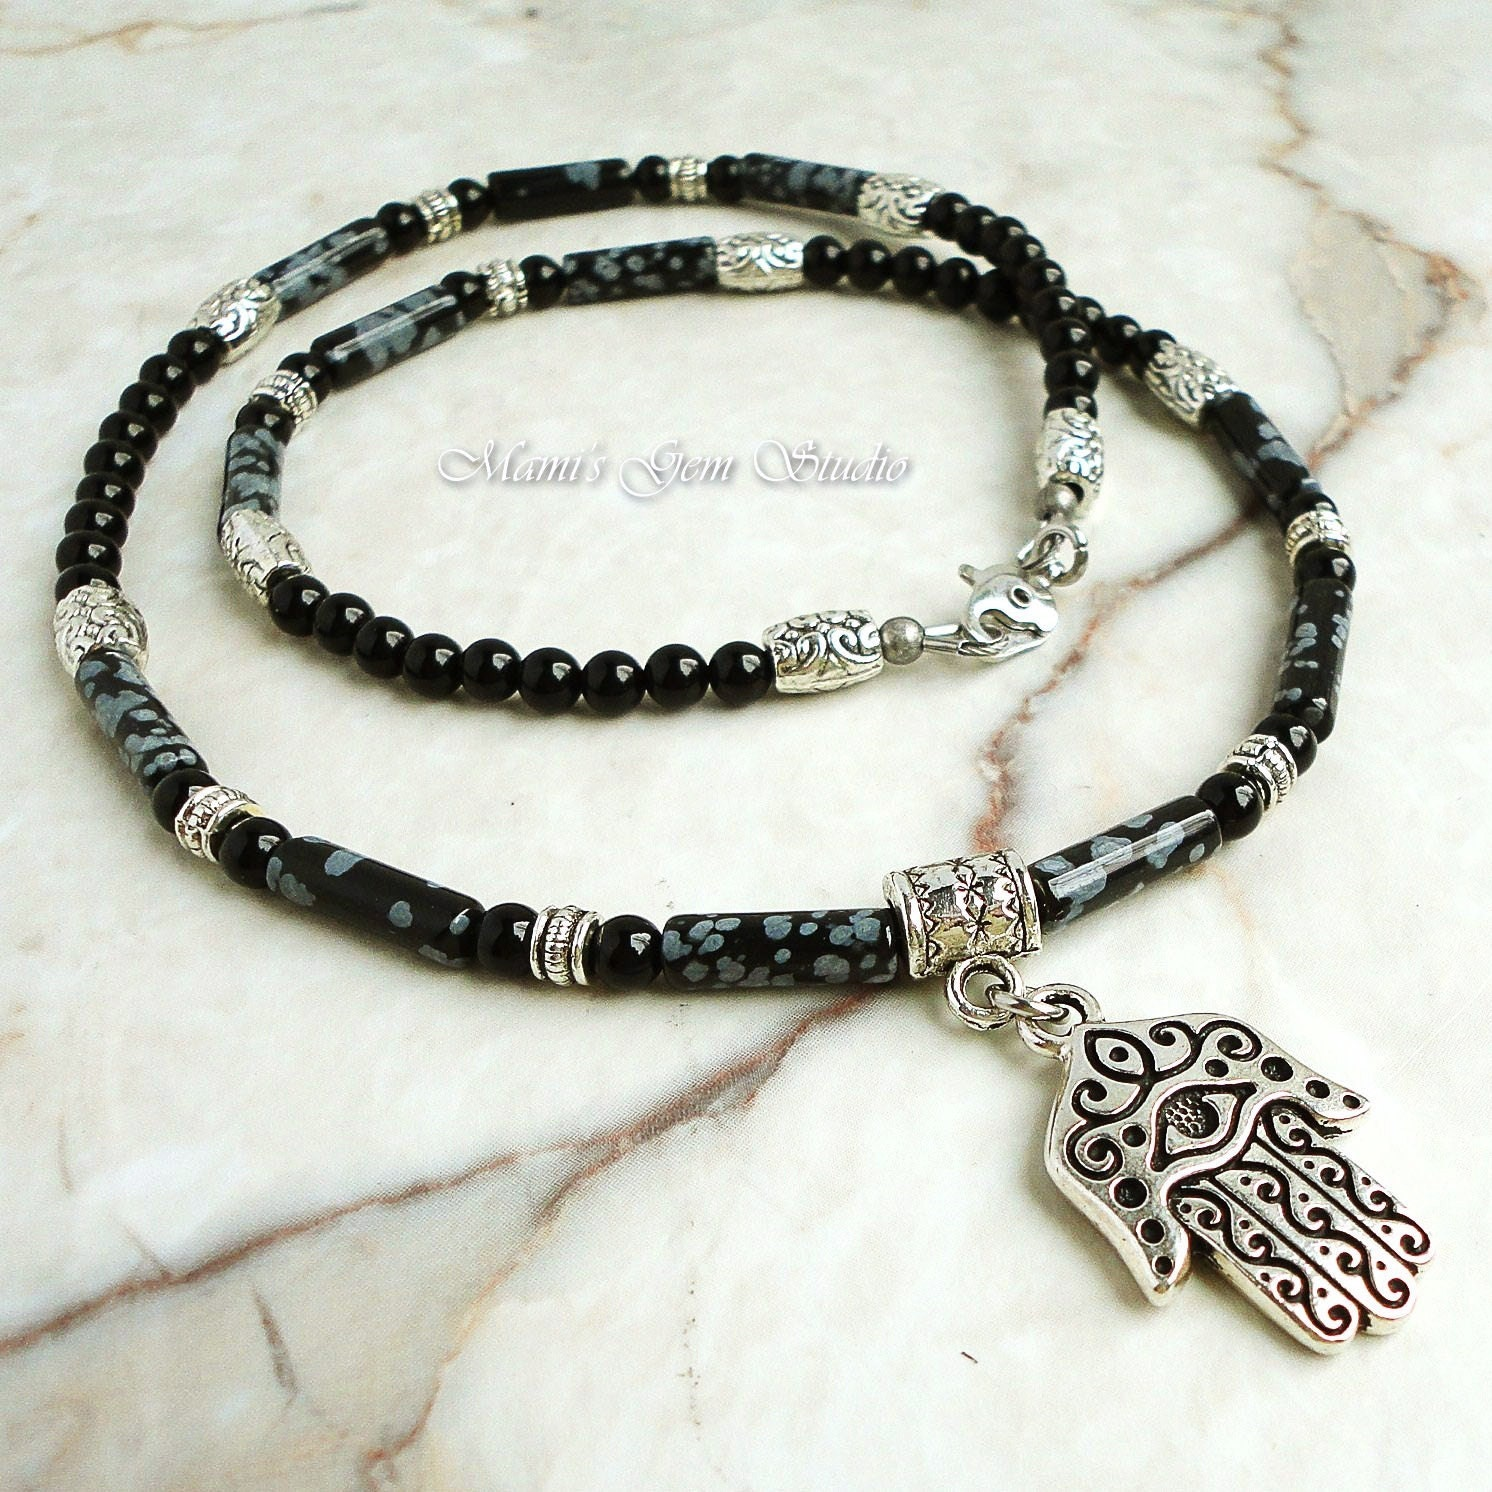 Hand Of Hamsa Charm Necklace For Men Black Onyx Snowflake